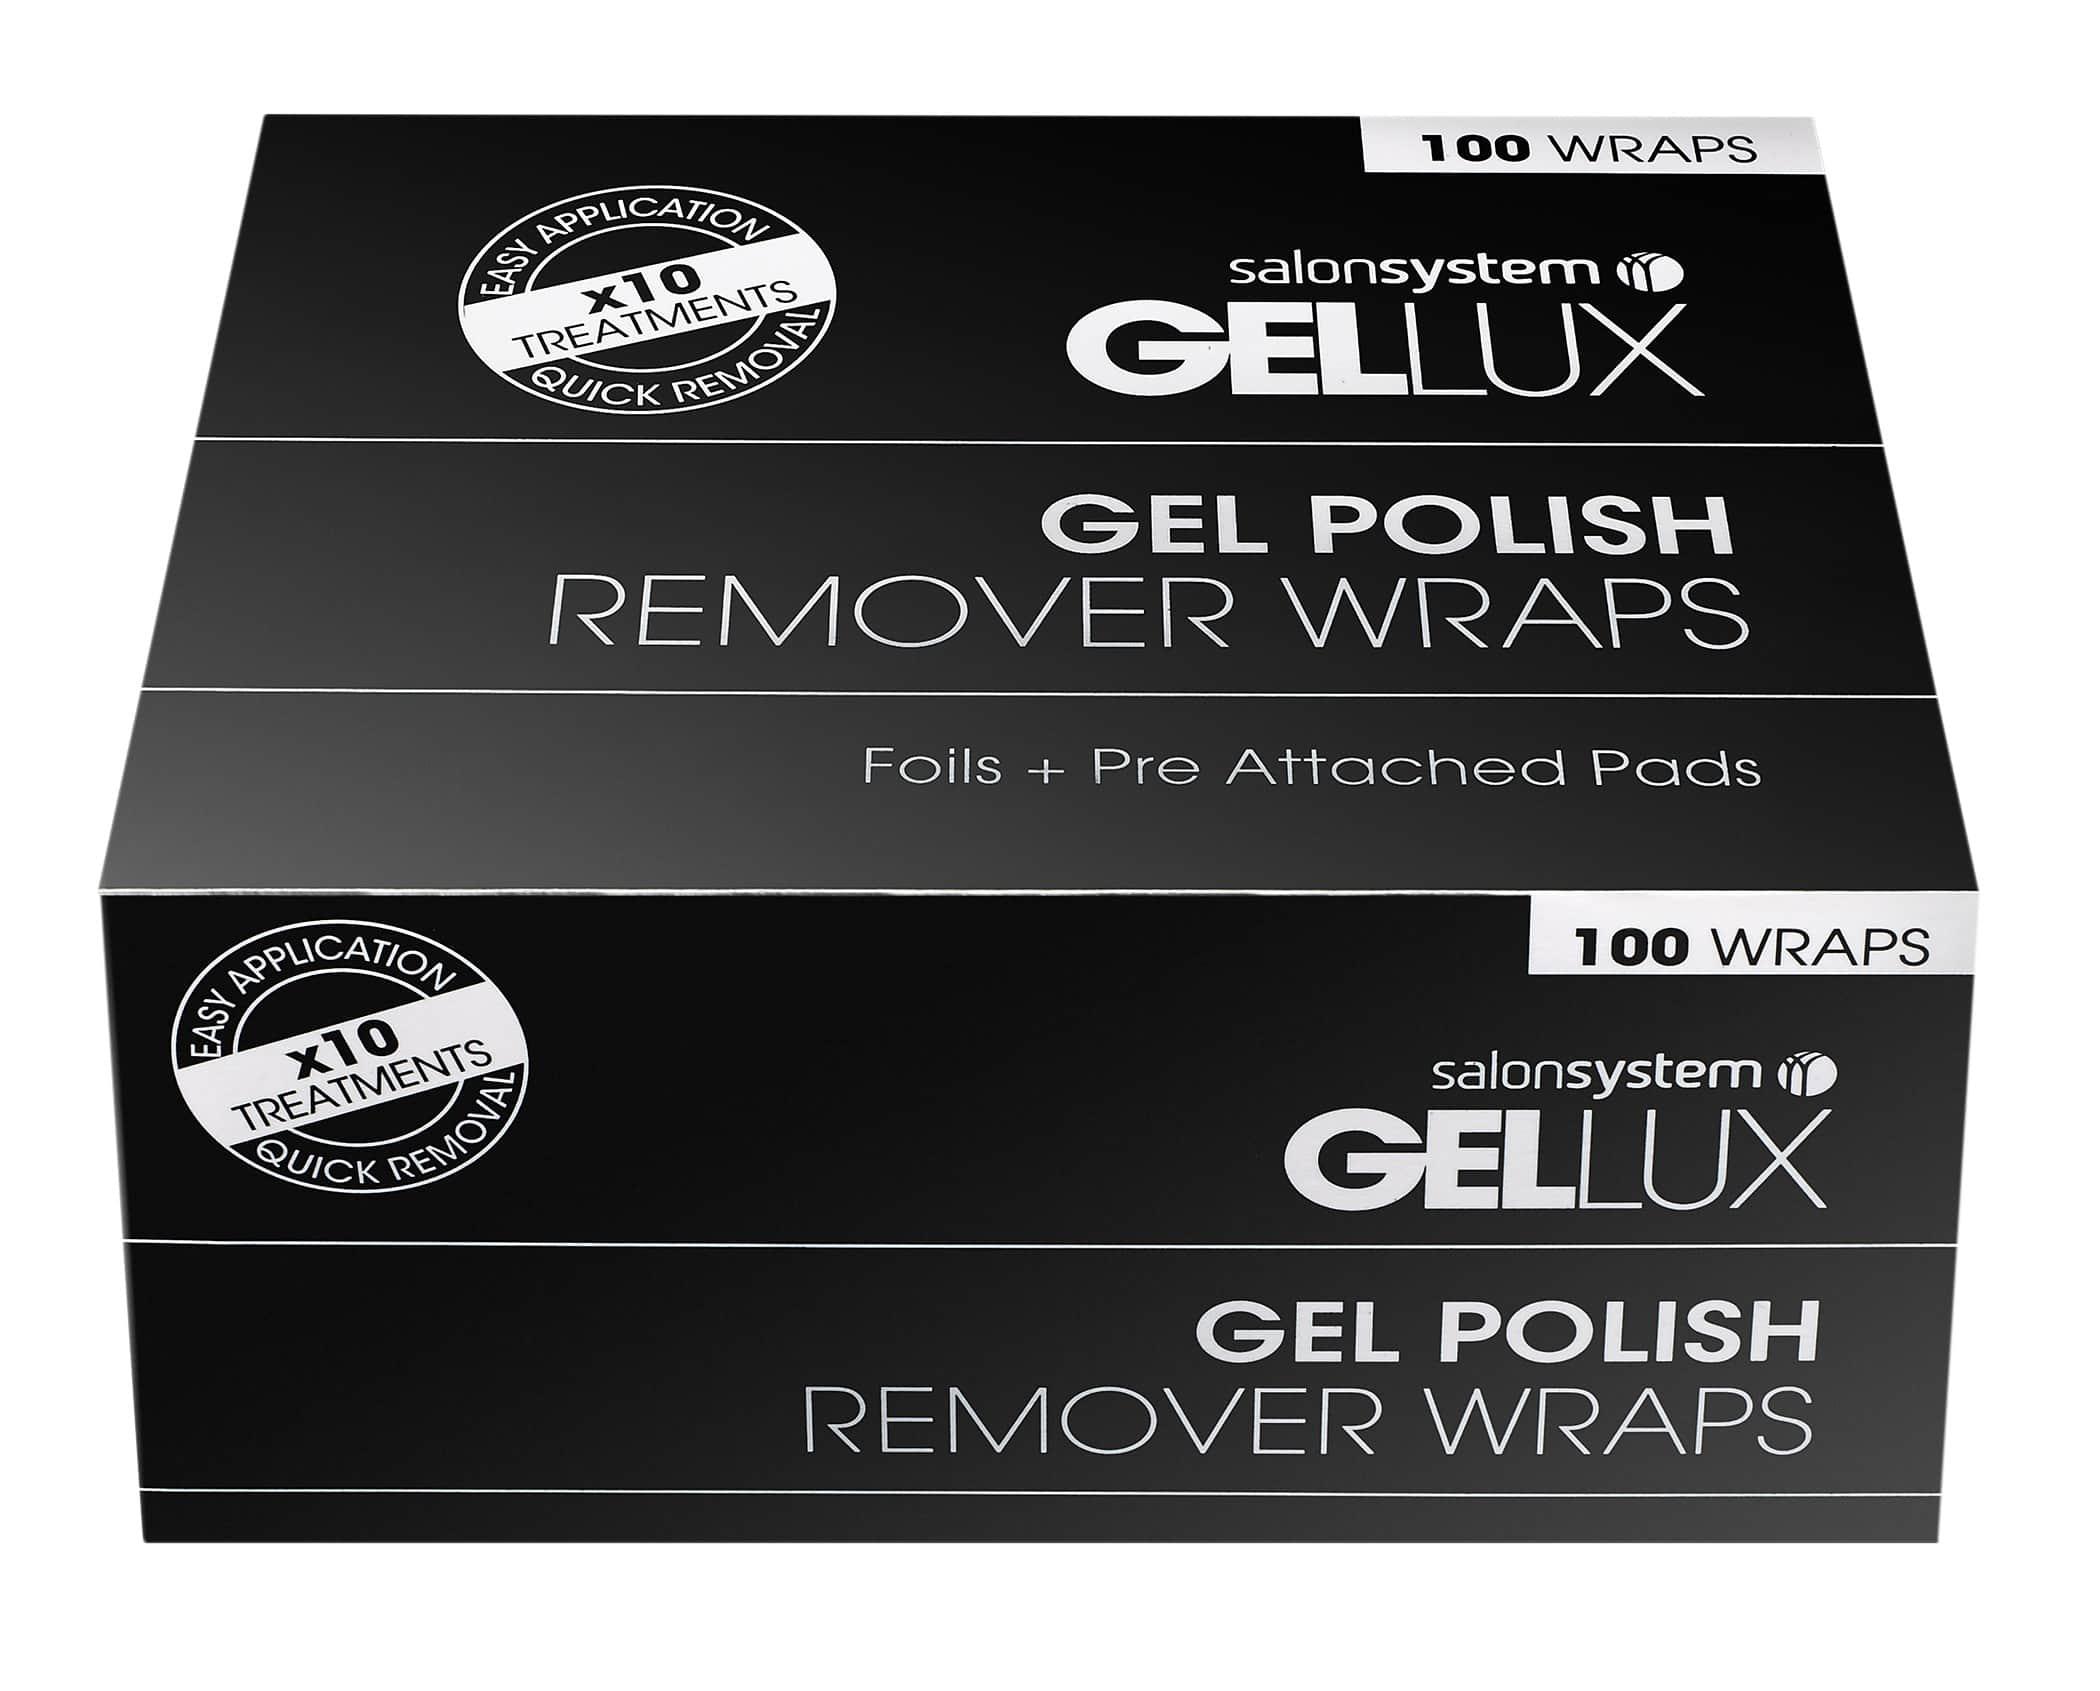 Gellux Gel Polish Remover Wraps